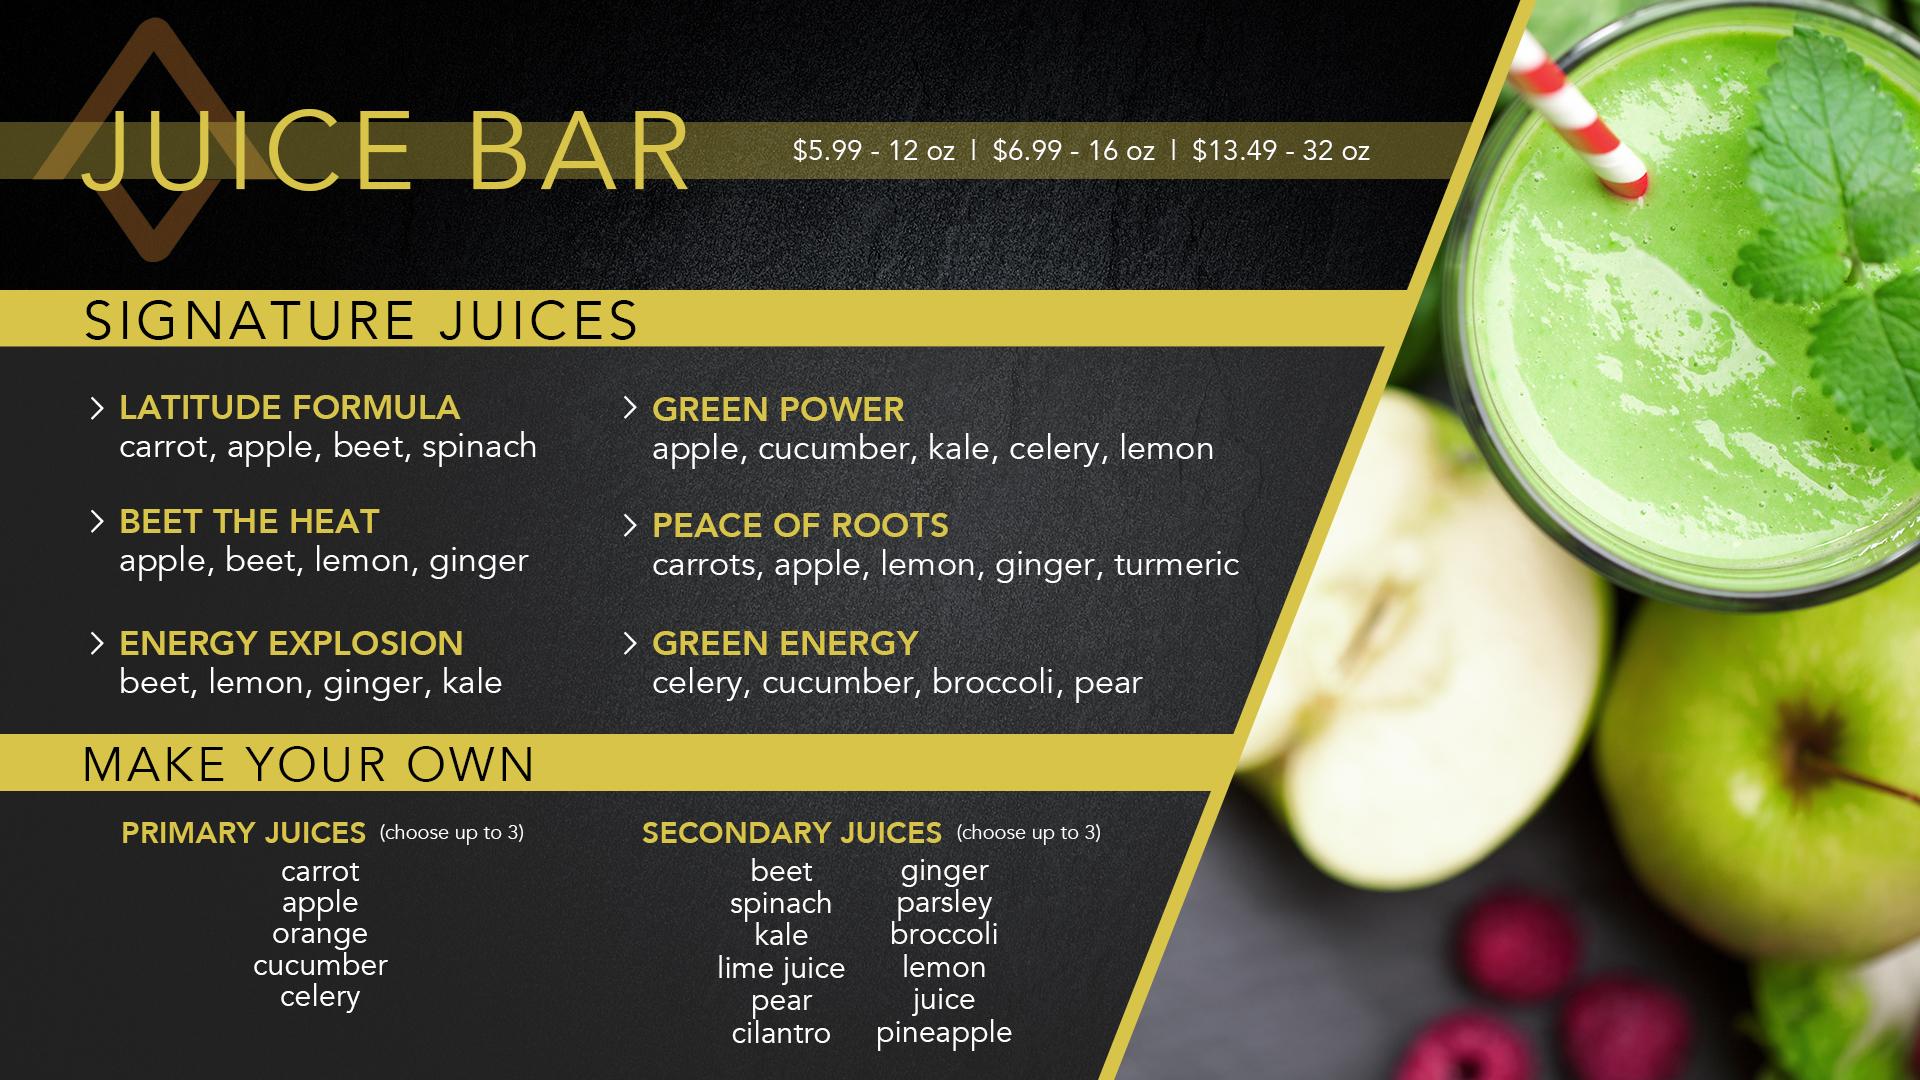 19-NVL-0010K - Juice Bar_R3_Apples